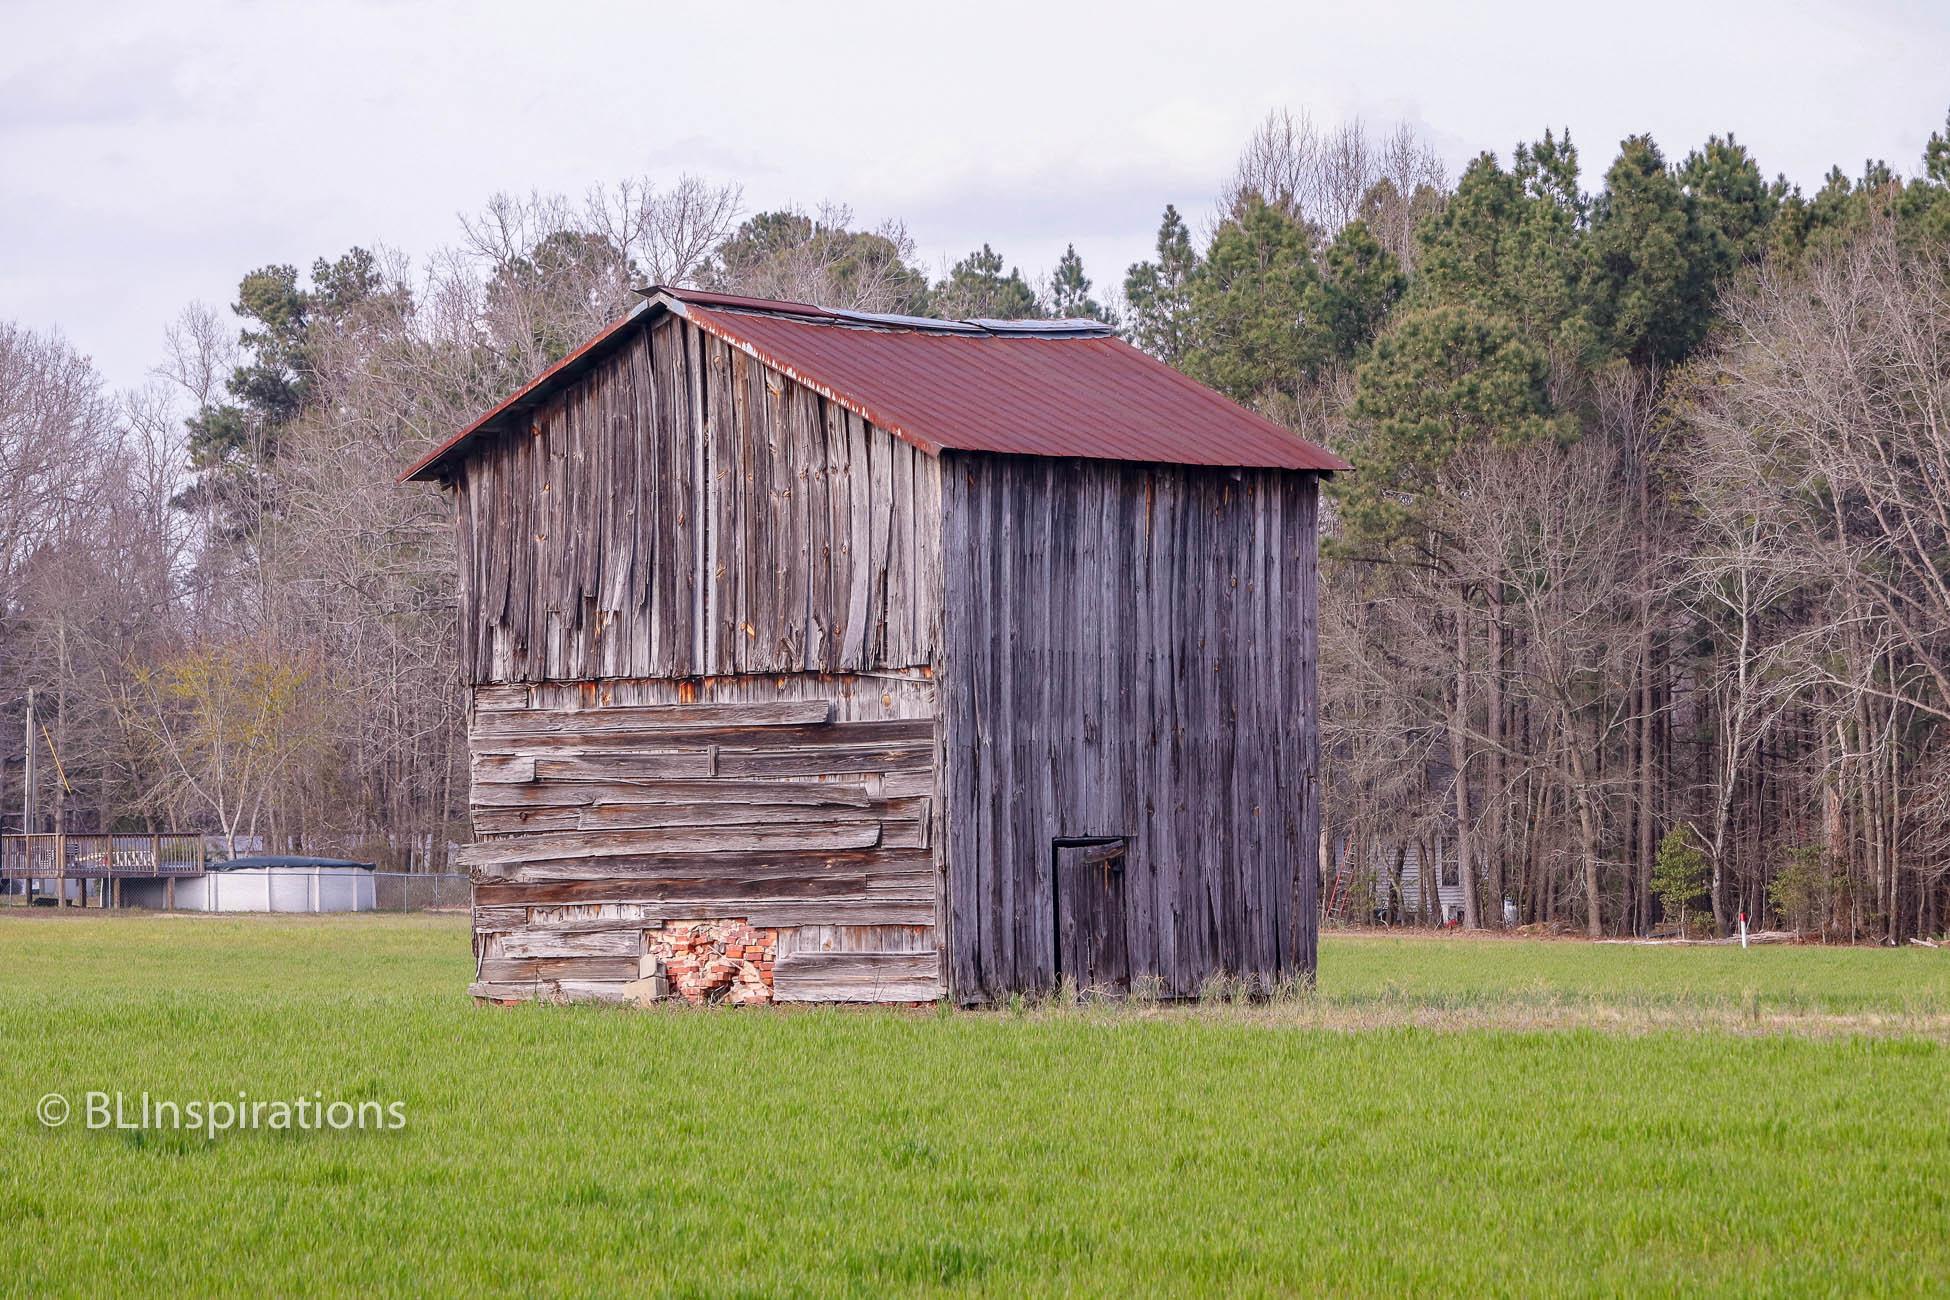 North Carolina Tobacco Drying Barn - BLInspirations